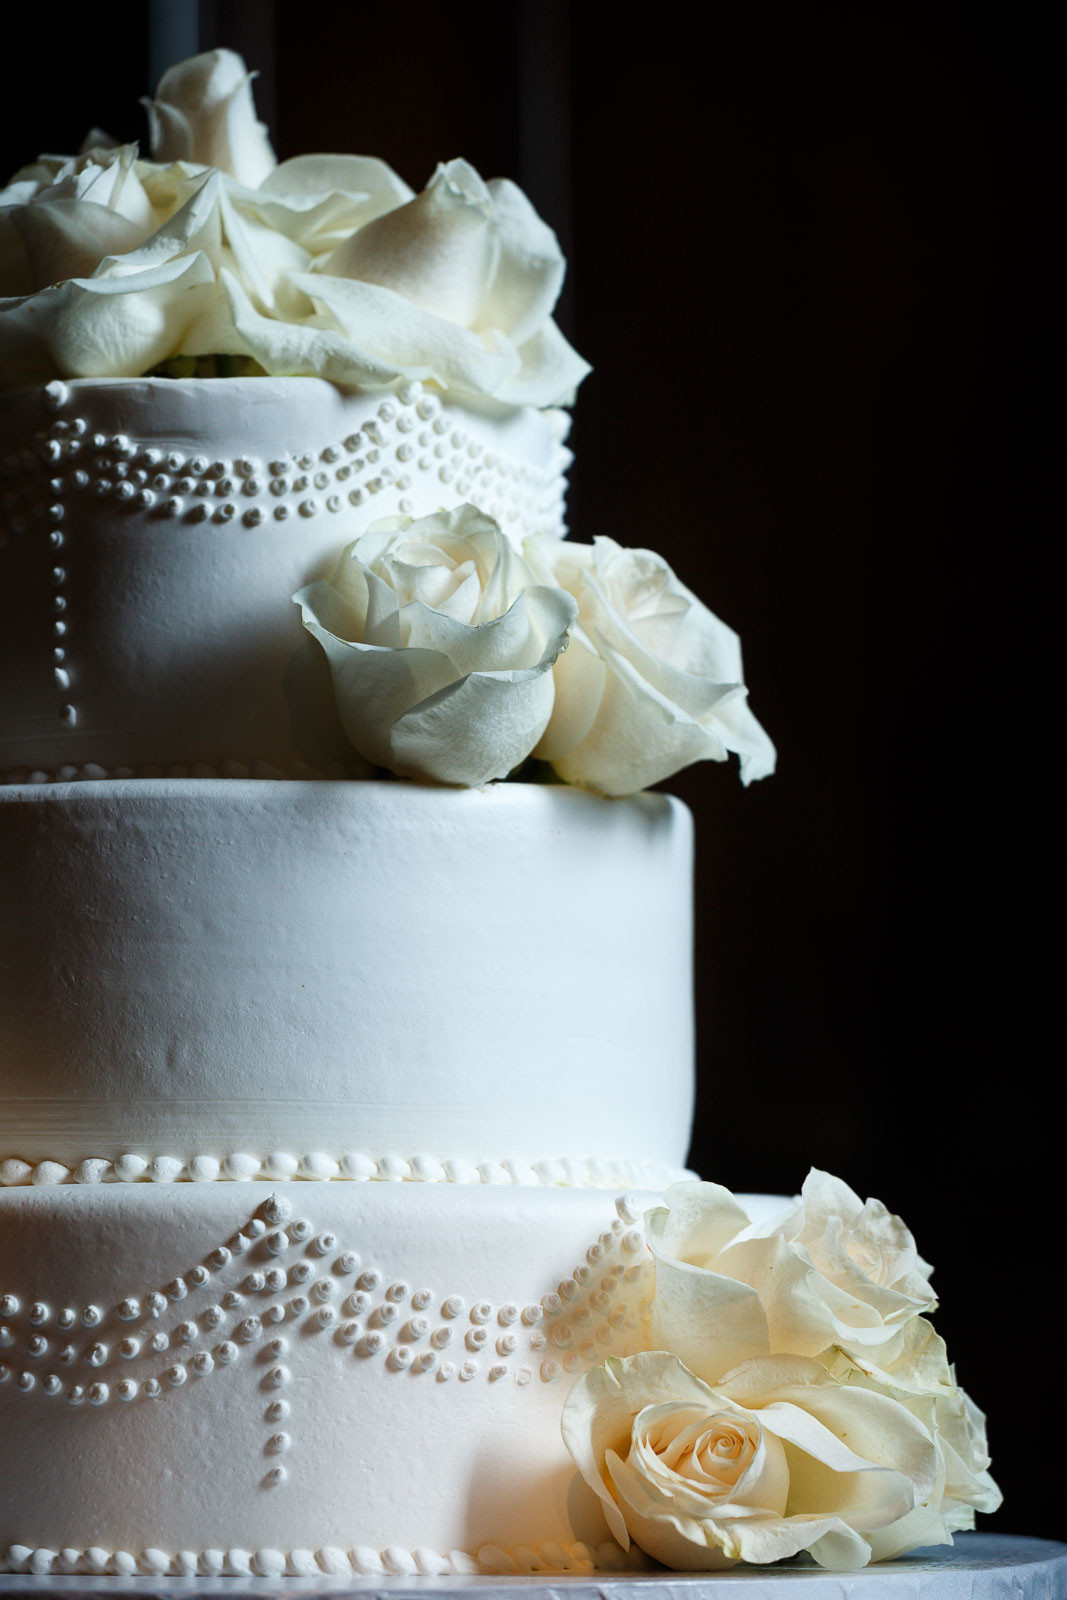 Featured Wedding Cakes -DIY Wedding Cakes - Austin Wedding Photographers -Alicia and Collin Wedding - Porto's Bakery